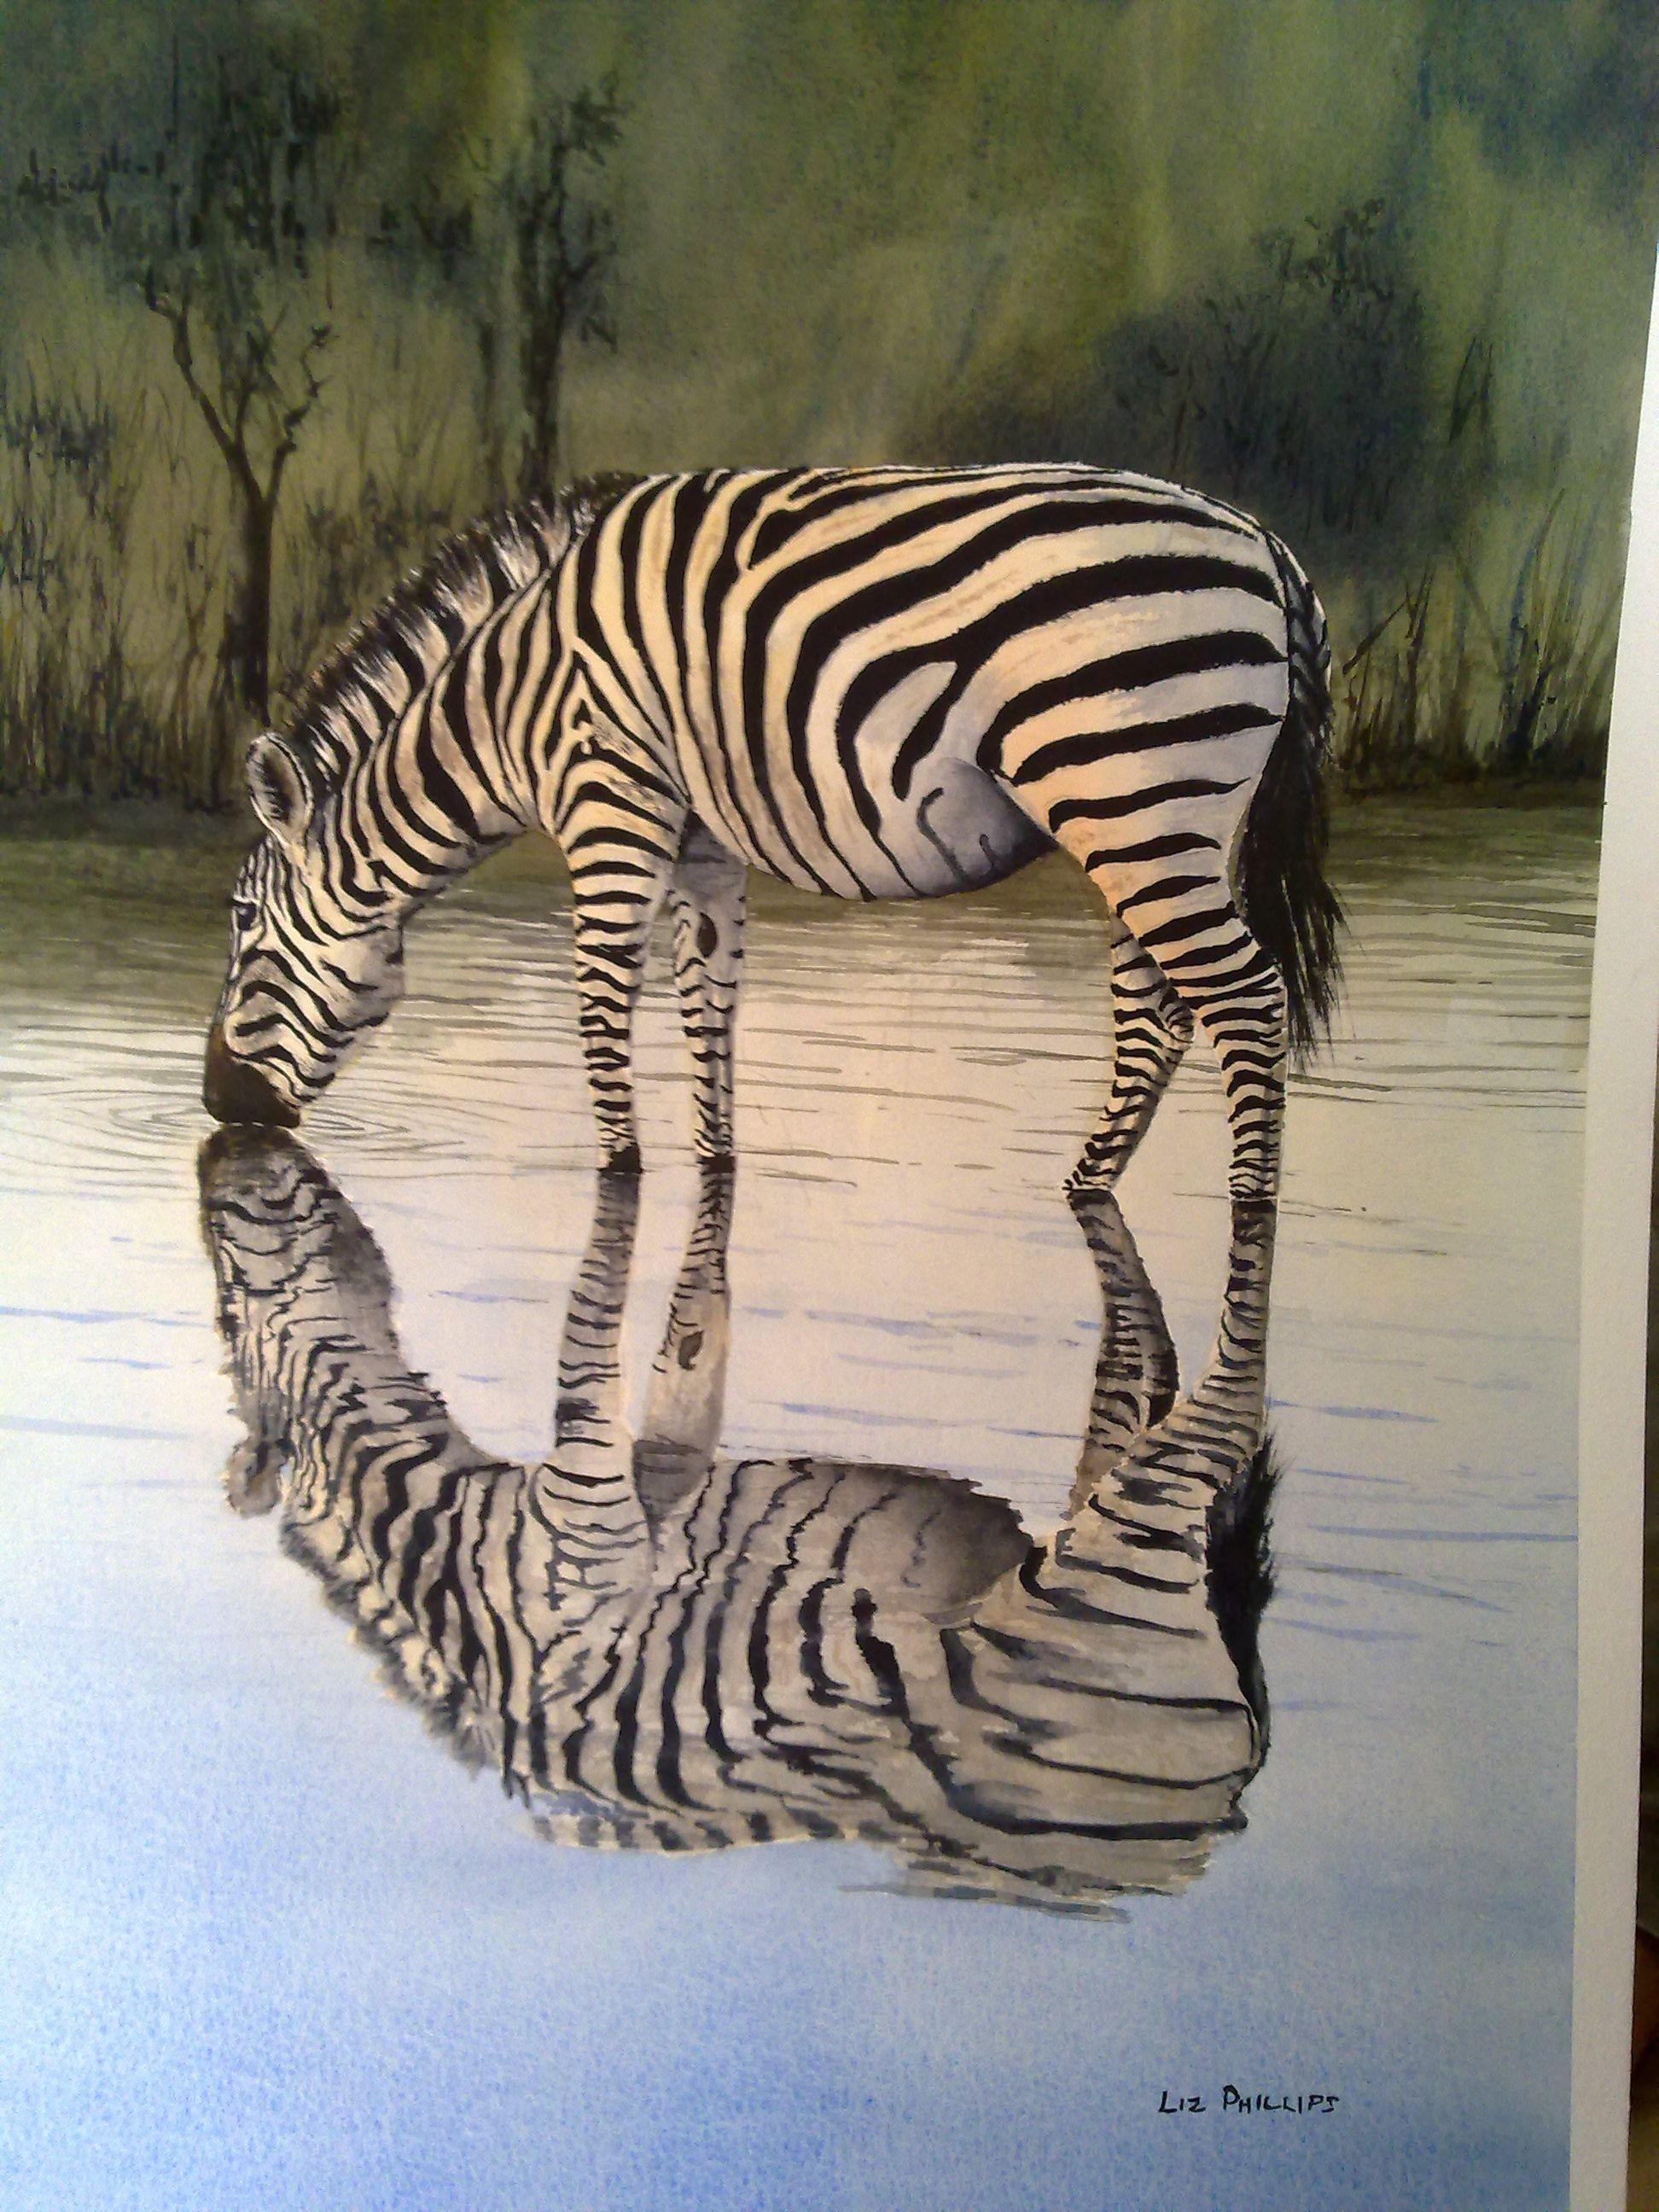 Zebra reflection photo